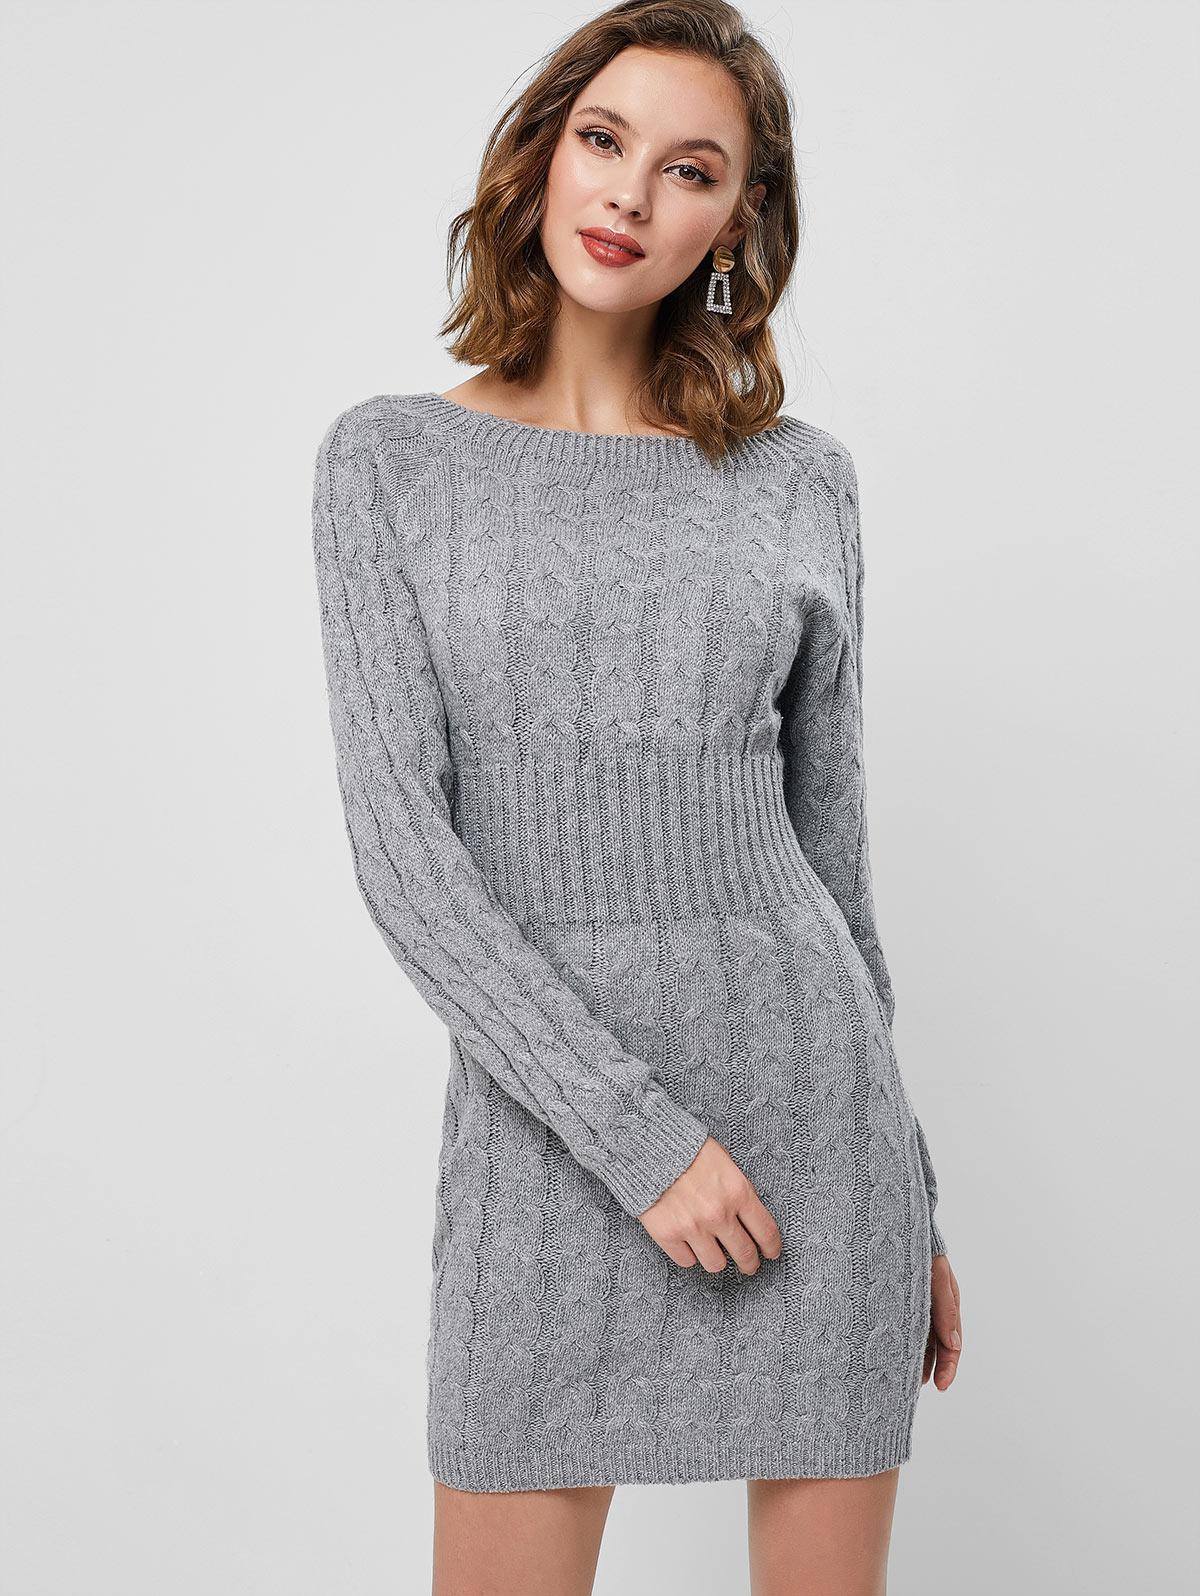 Raglan Sleeve Cable Knit Mini Sweater Dress thumbnail